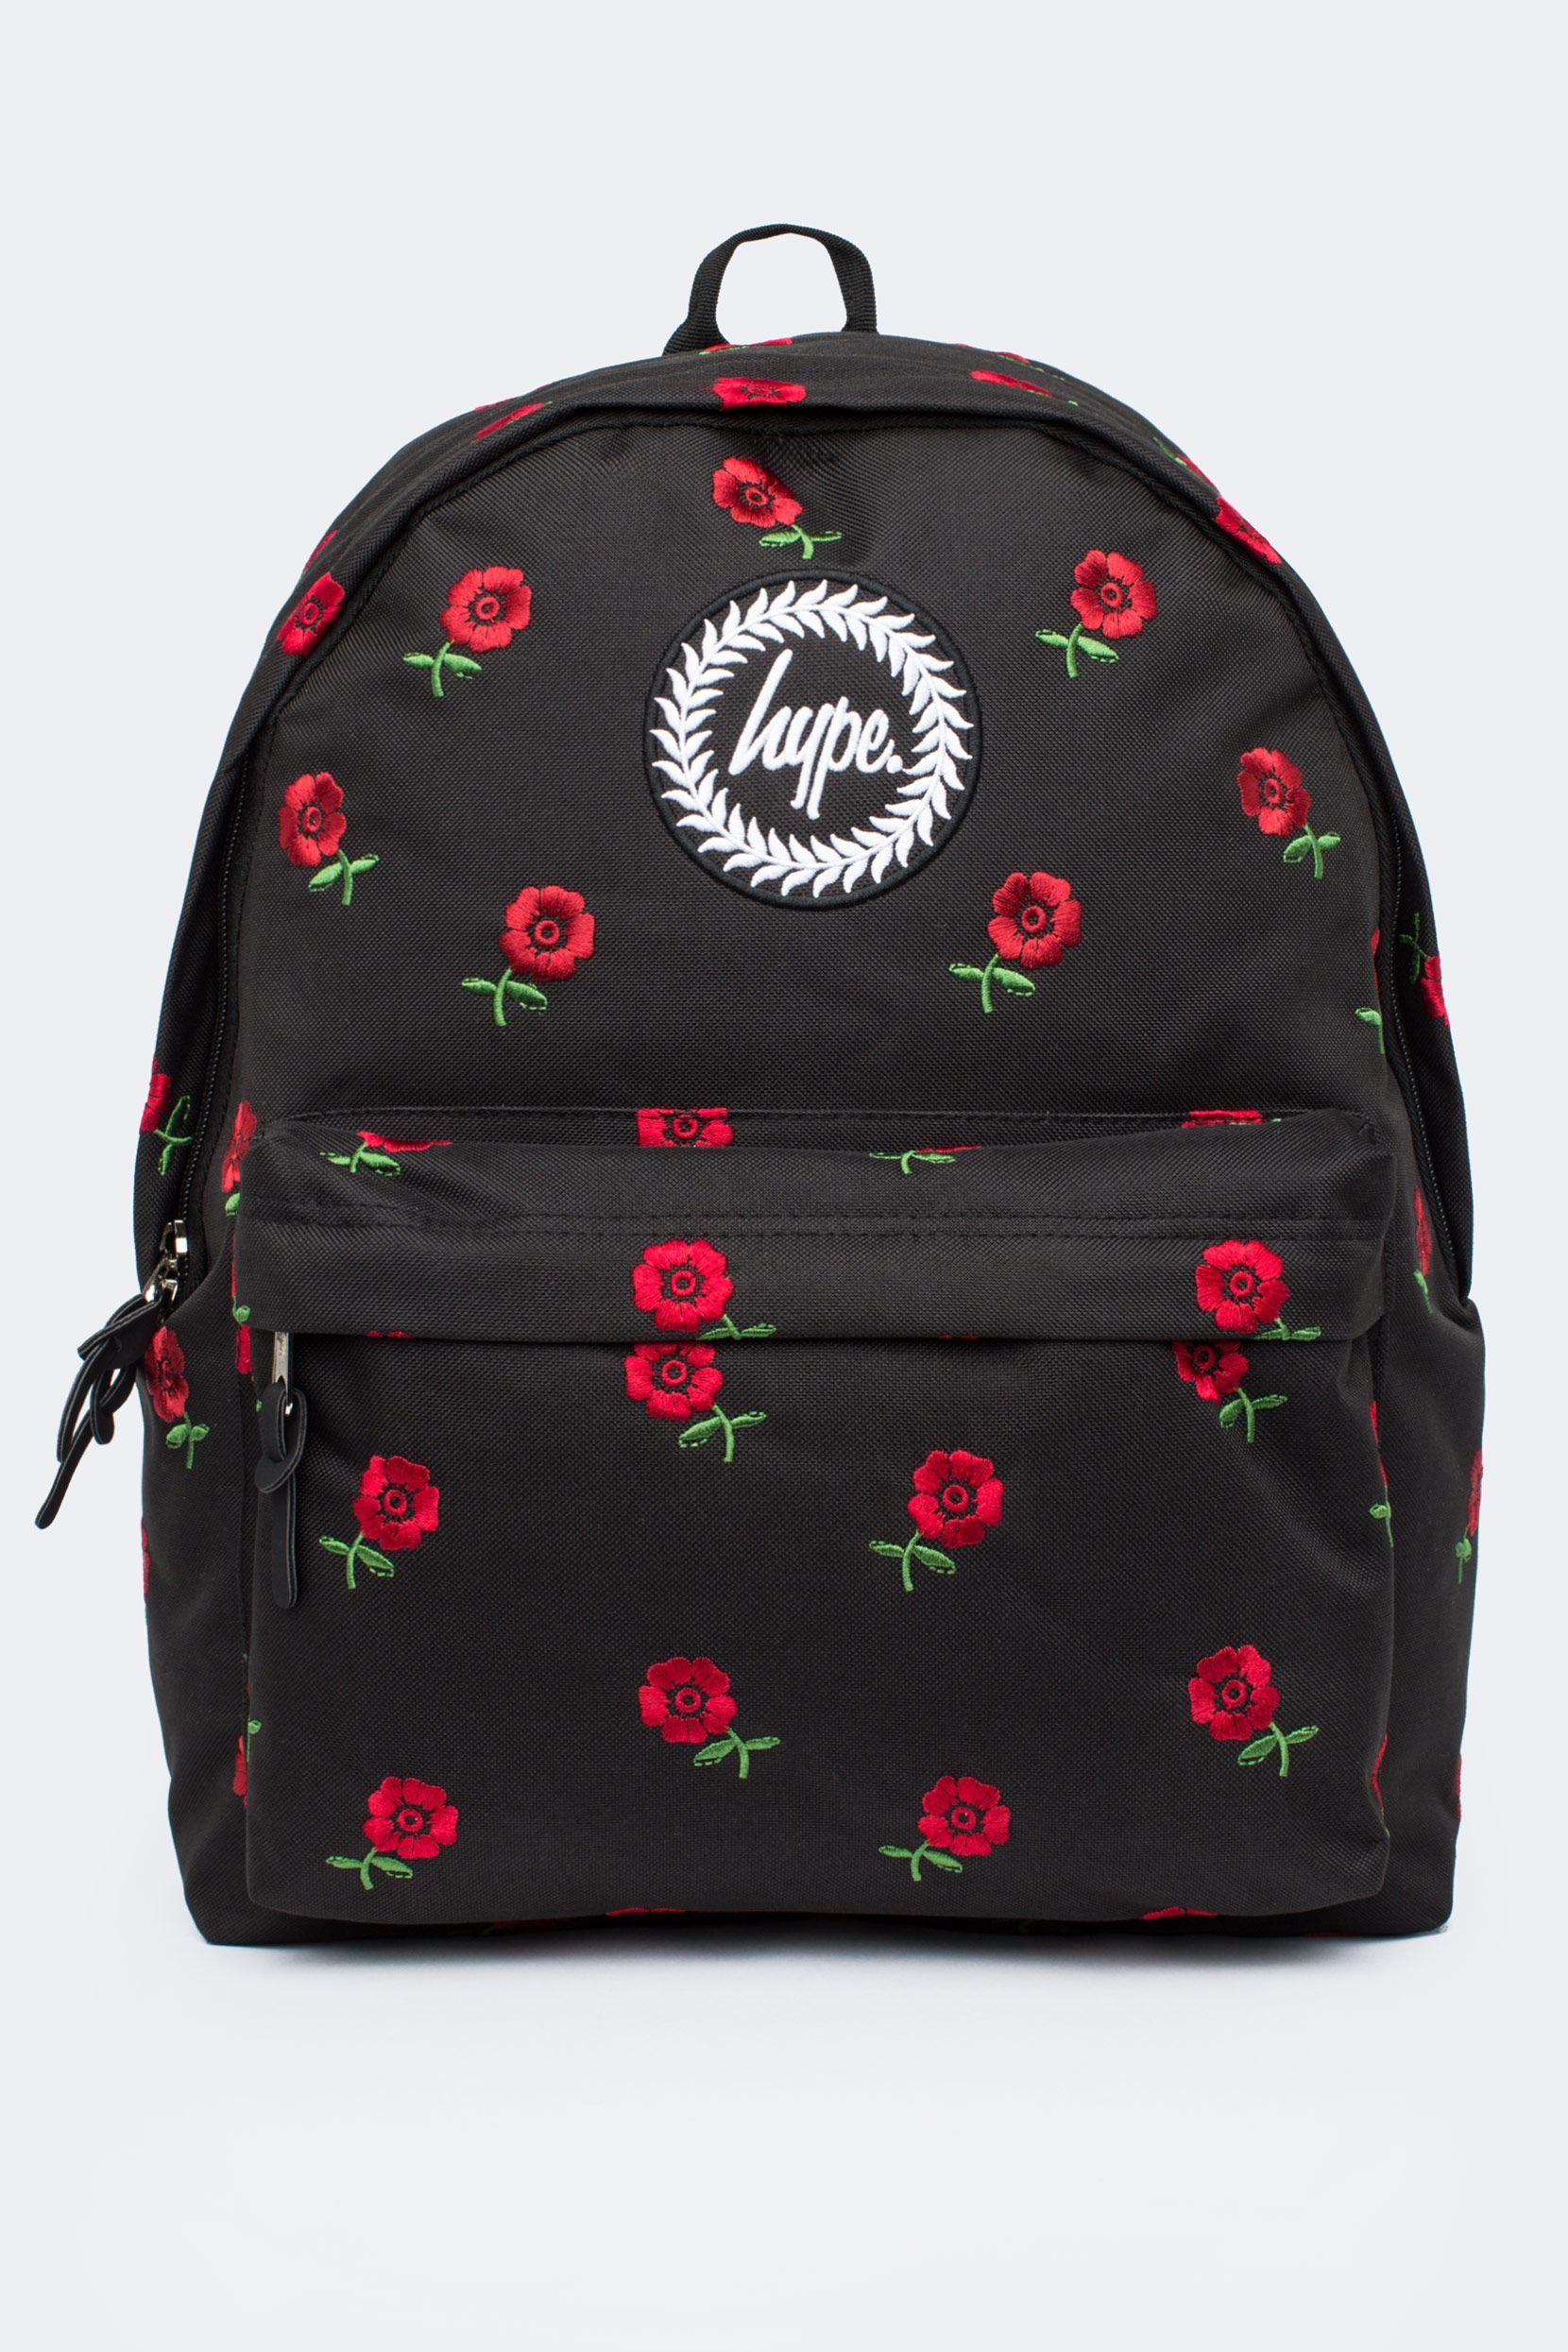 25 best ideas about kipling backpack on pinterest school handbags - Hype Embroidered Rose Backpack Blossomsbackpackschool